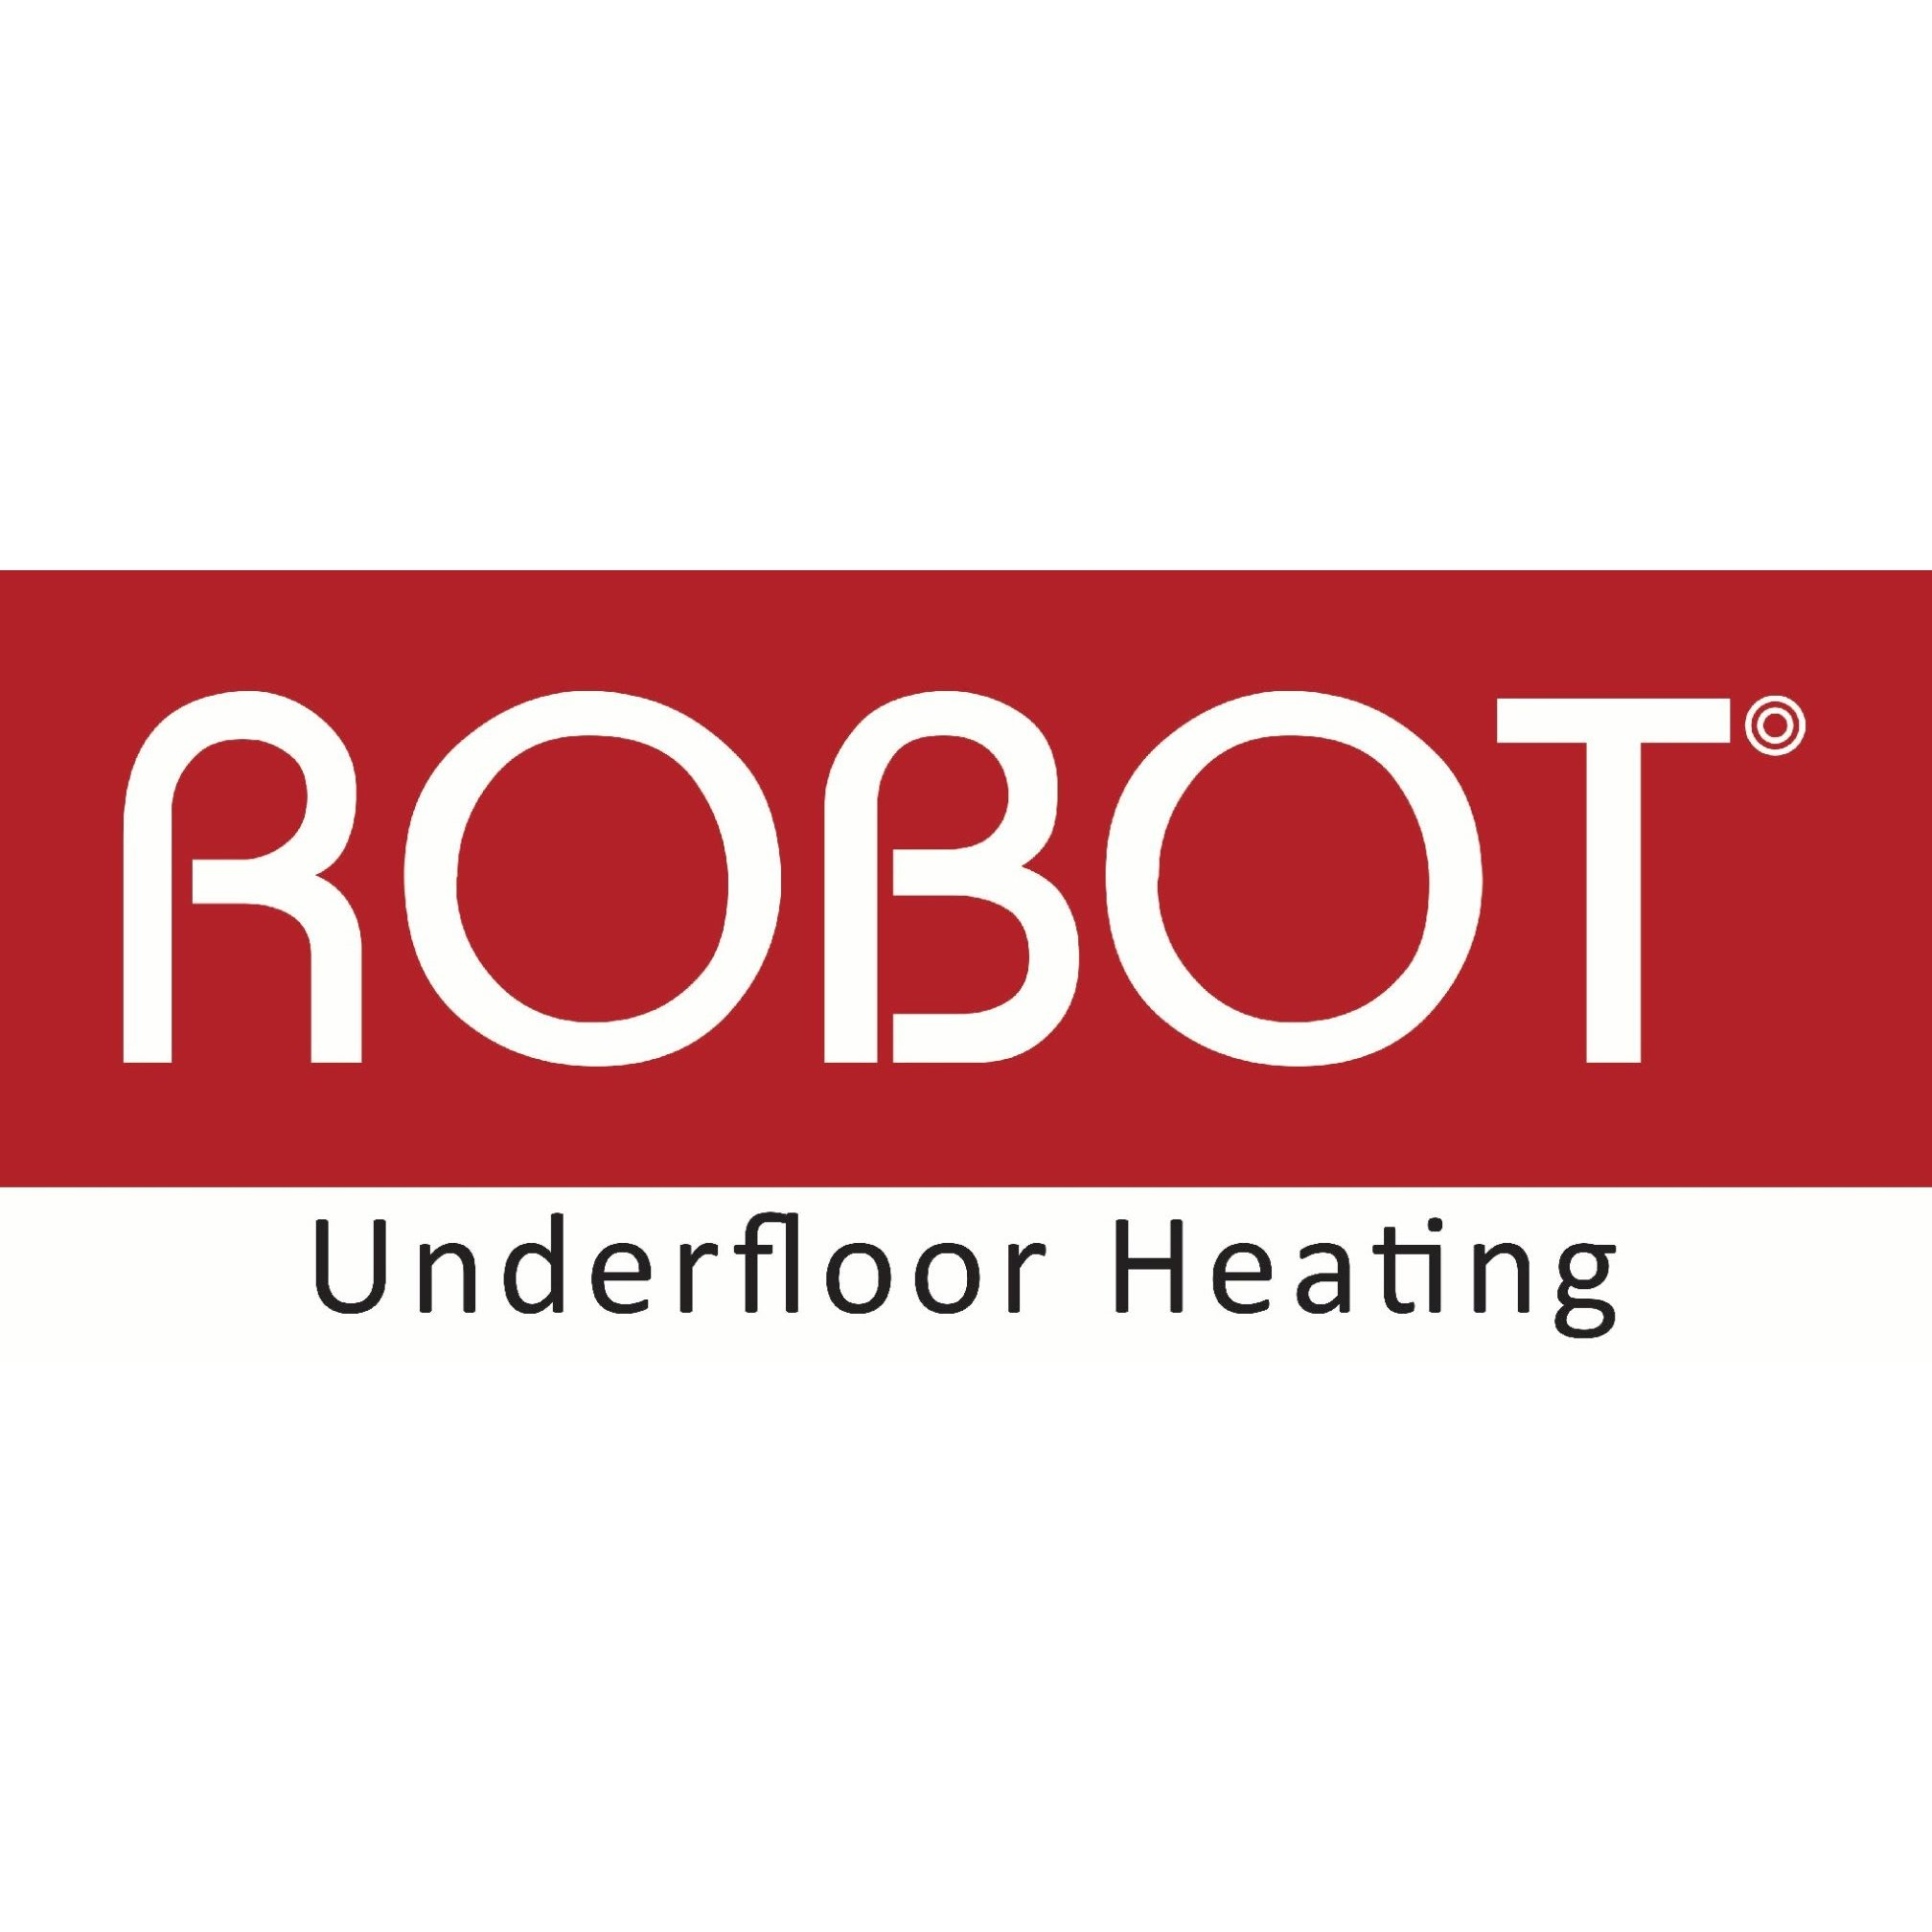 Robot Underfloor Heating - Inverness, Inverness-Shire IV3 8EX - 07482 733678 | ShowMeLocal.com